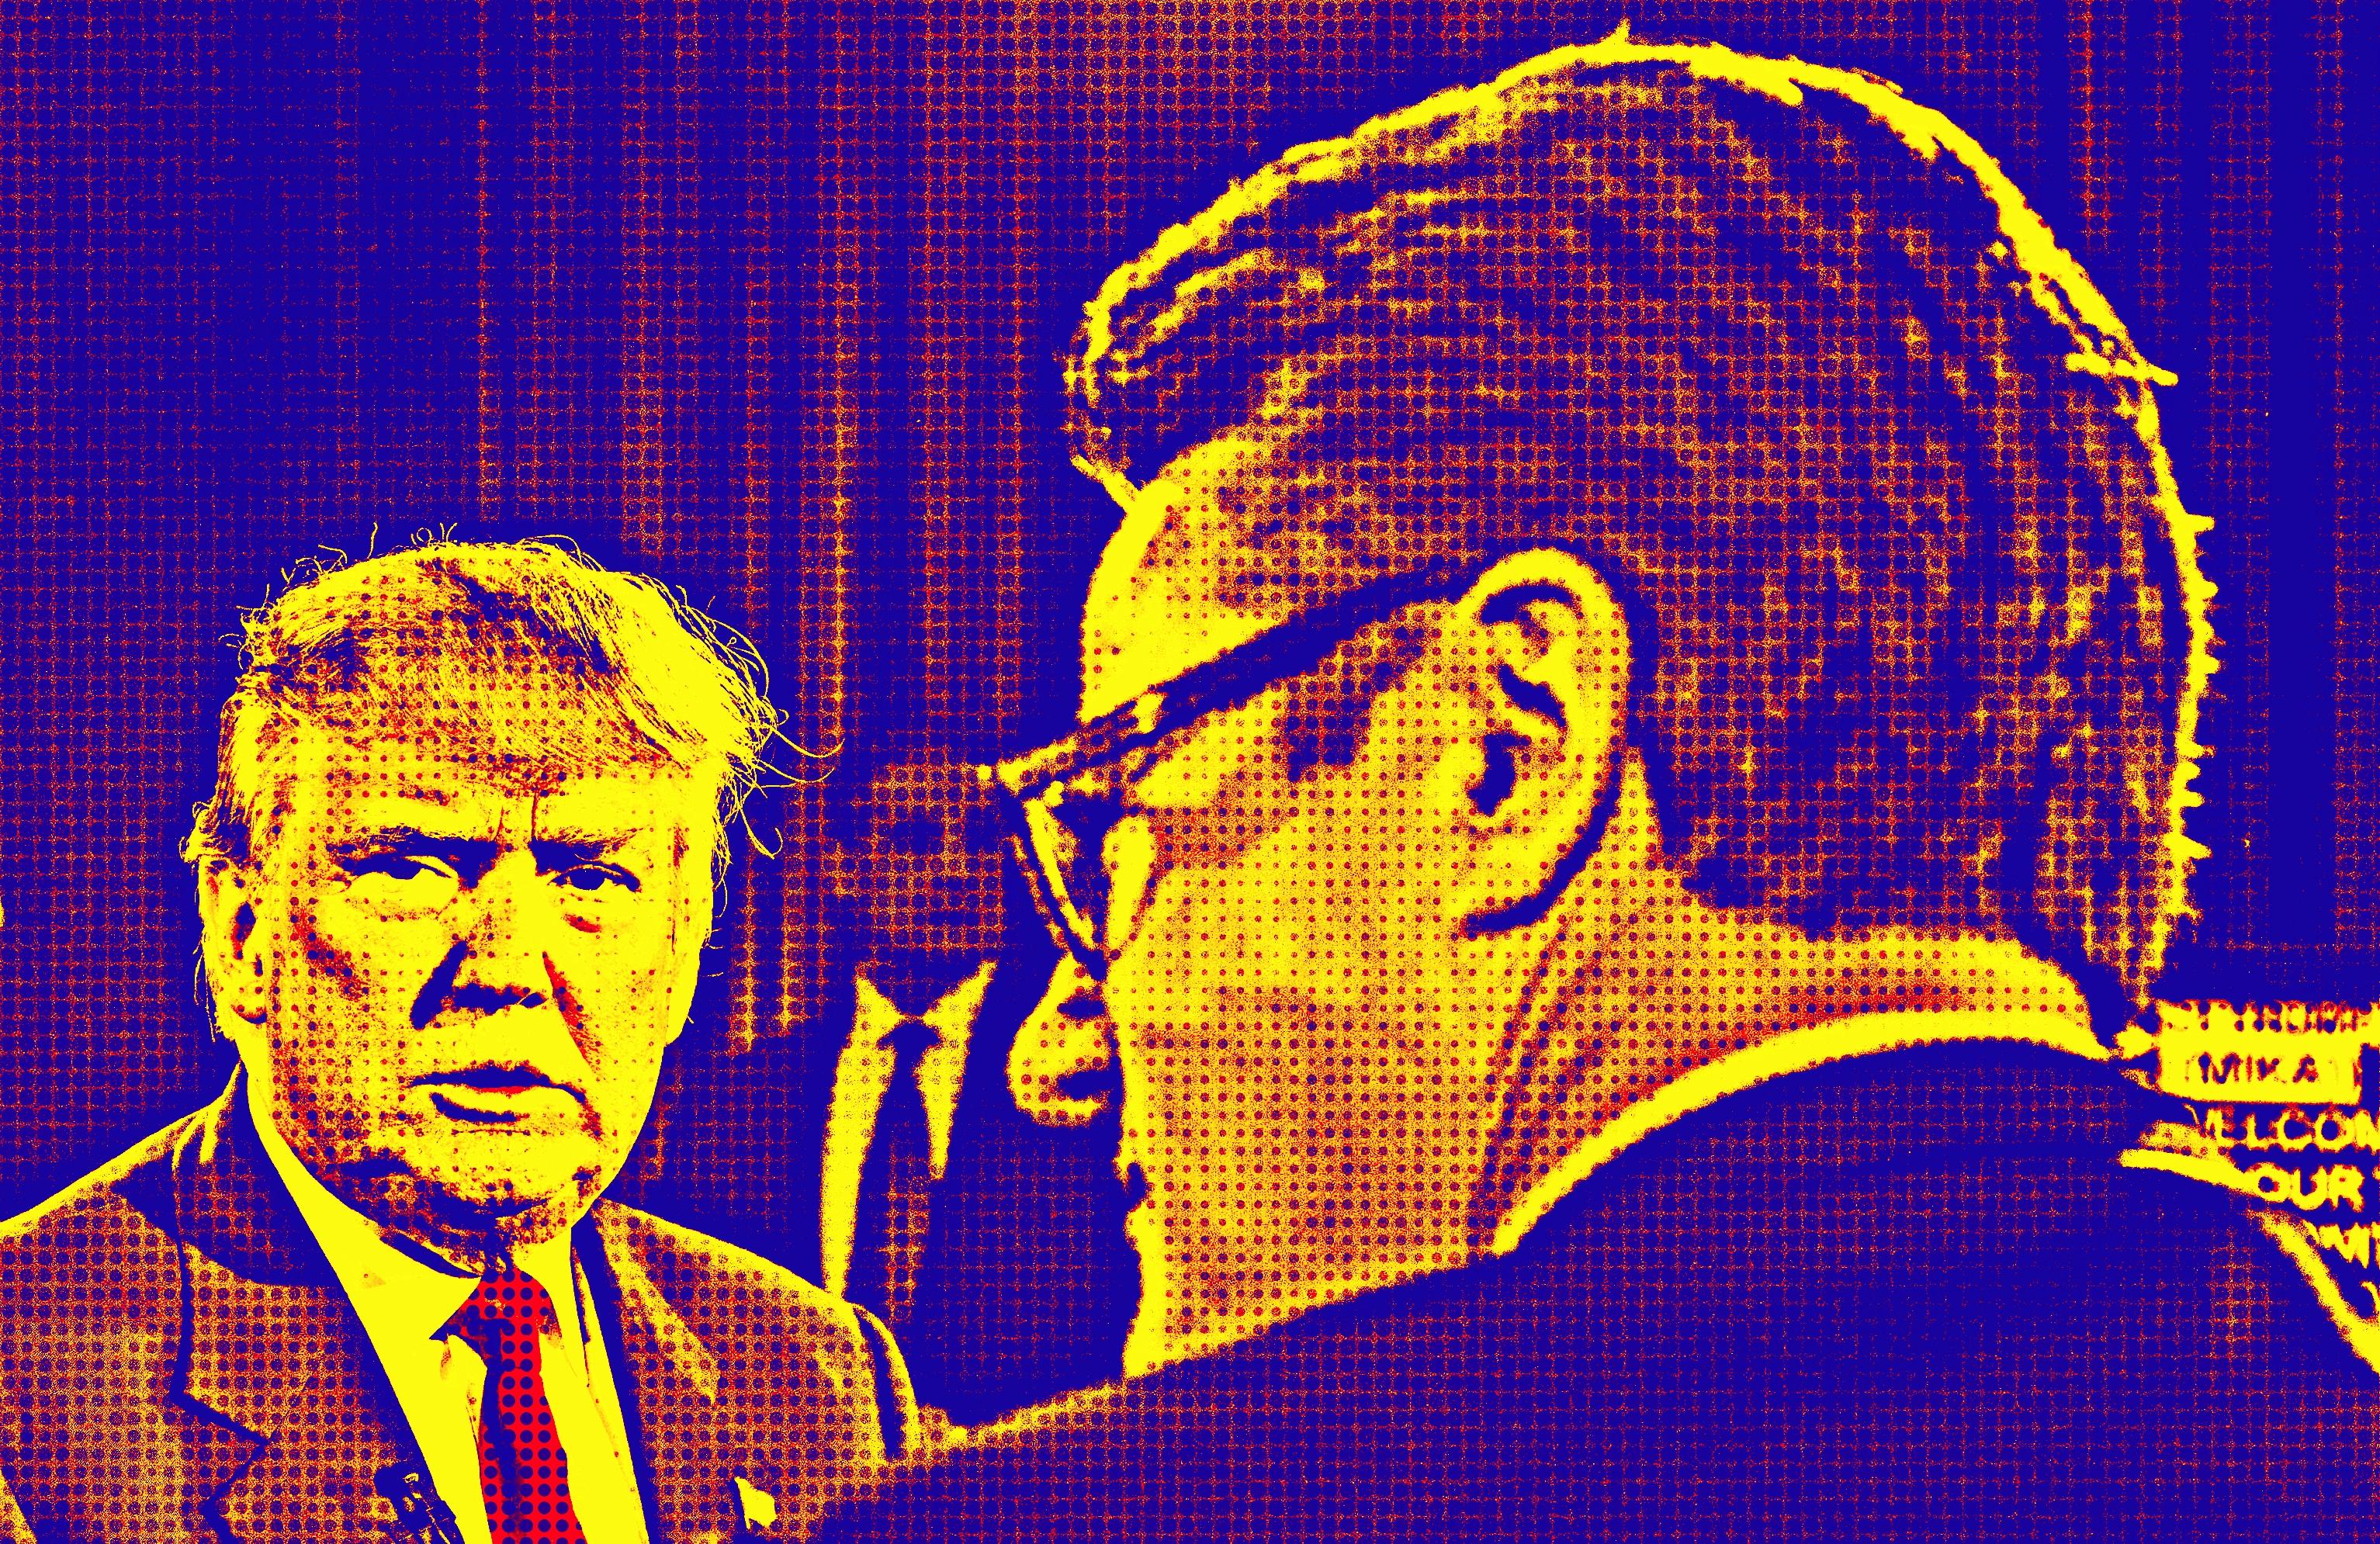 TrumpScarfilter